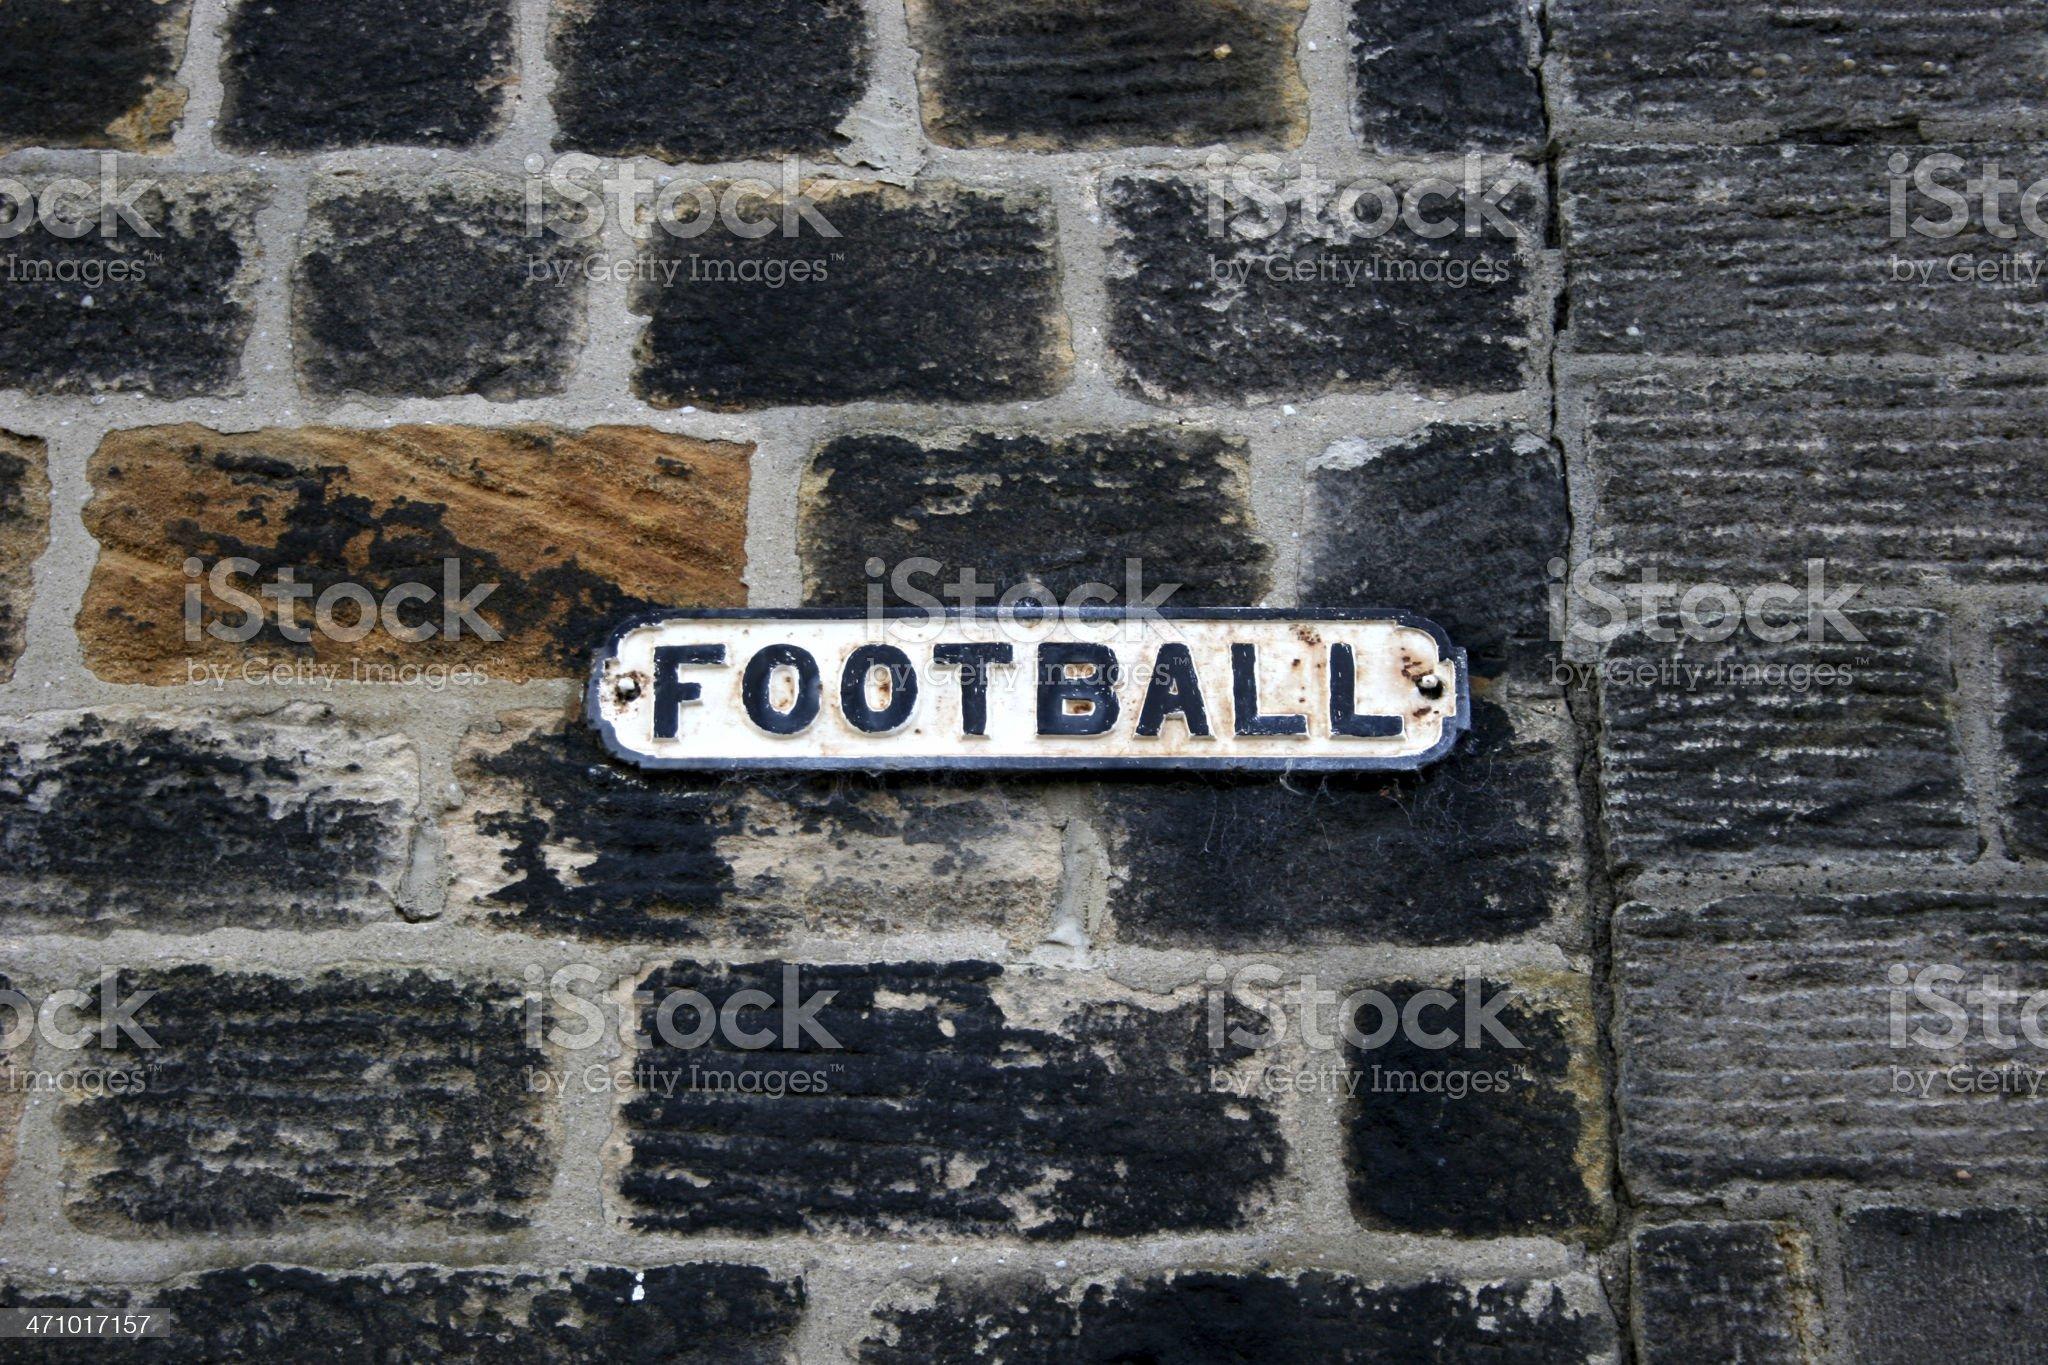 Football - street sign royalty-free stock photo